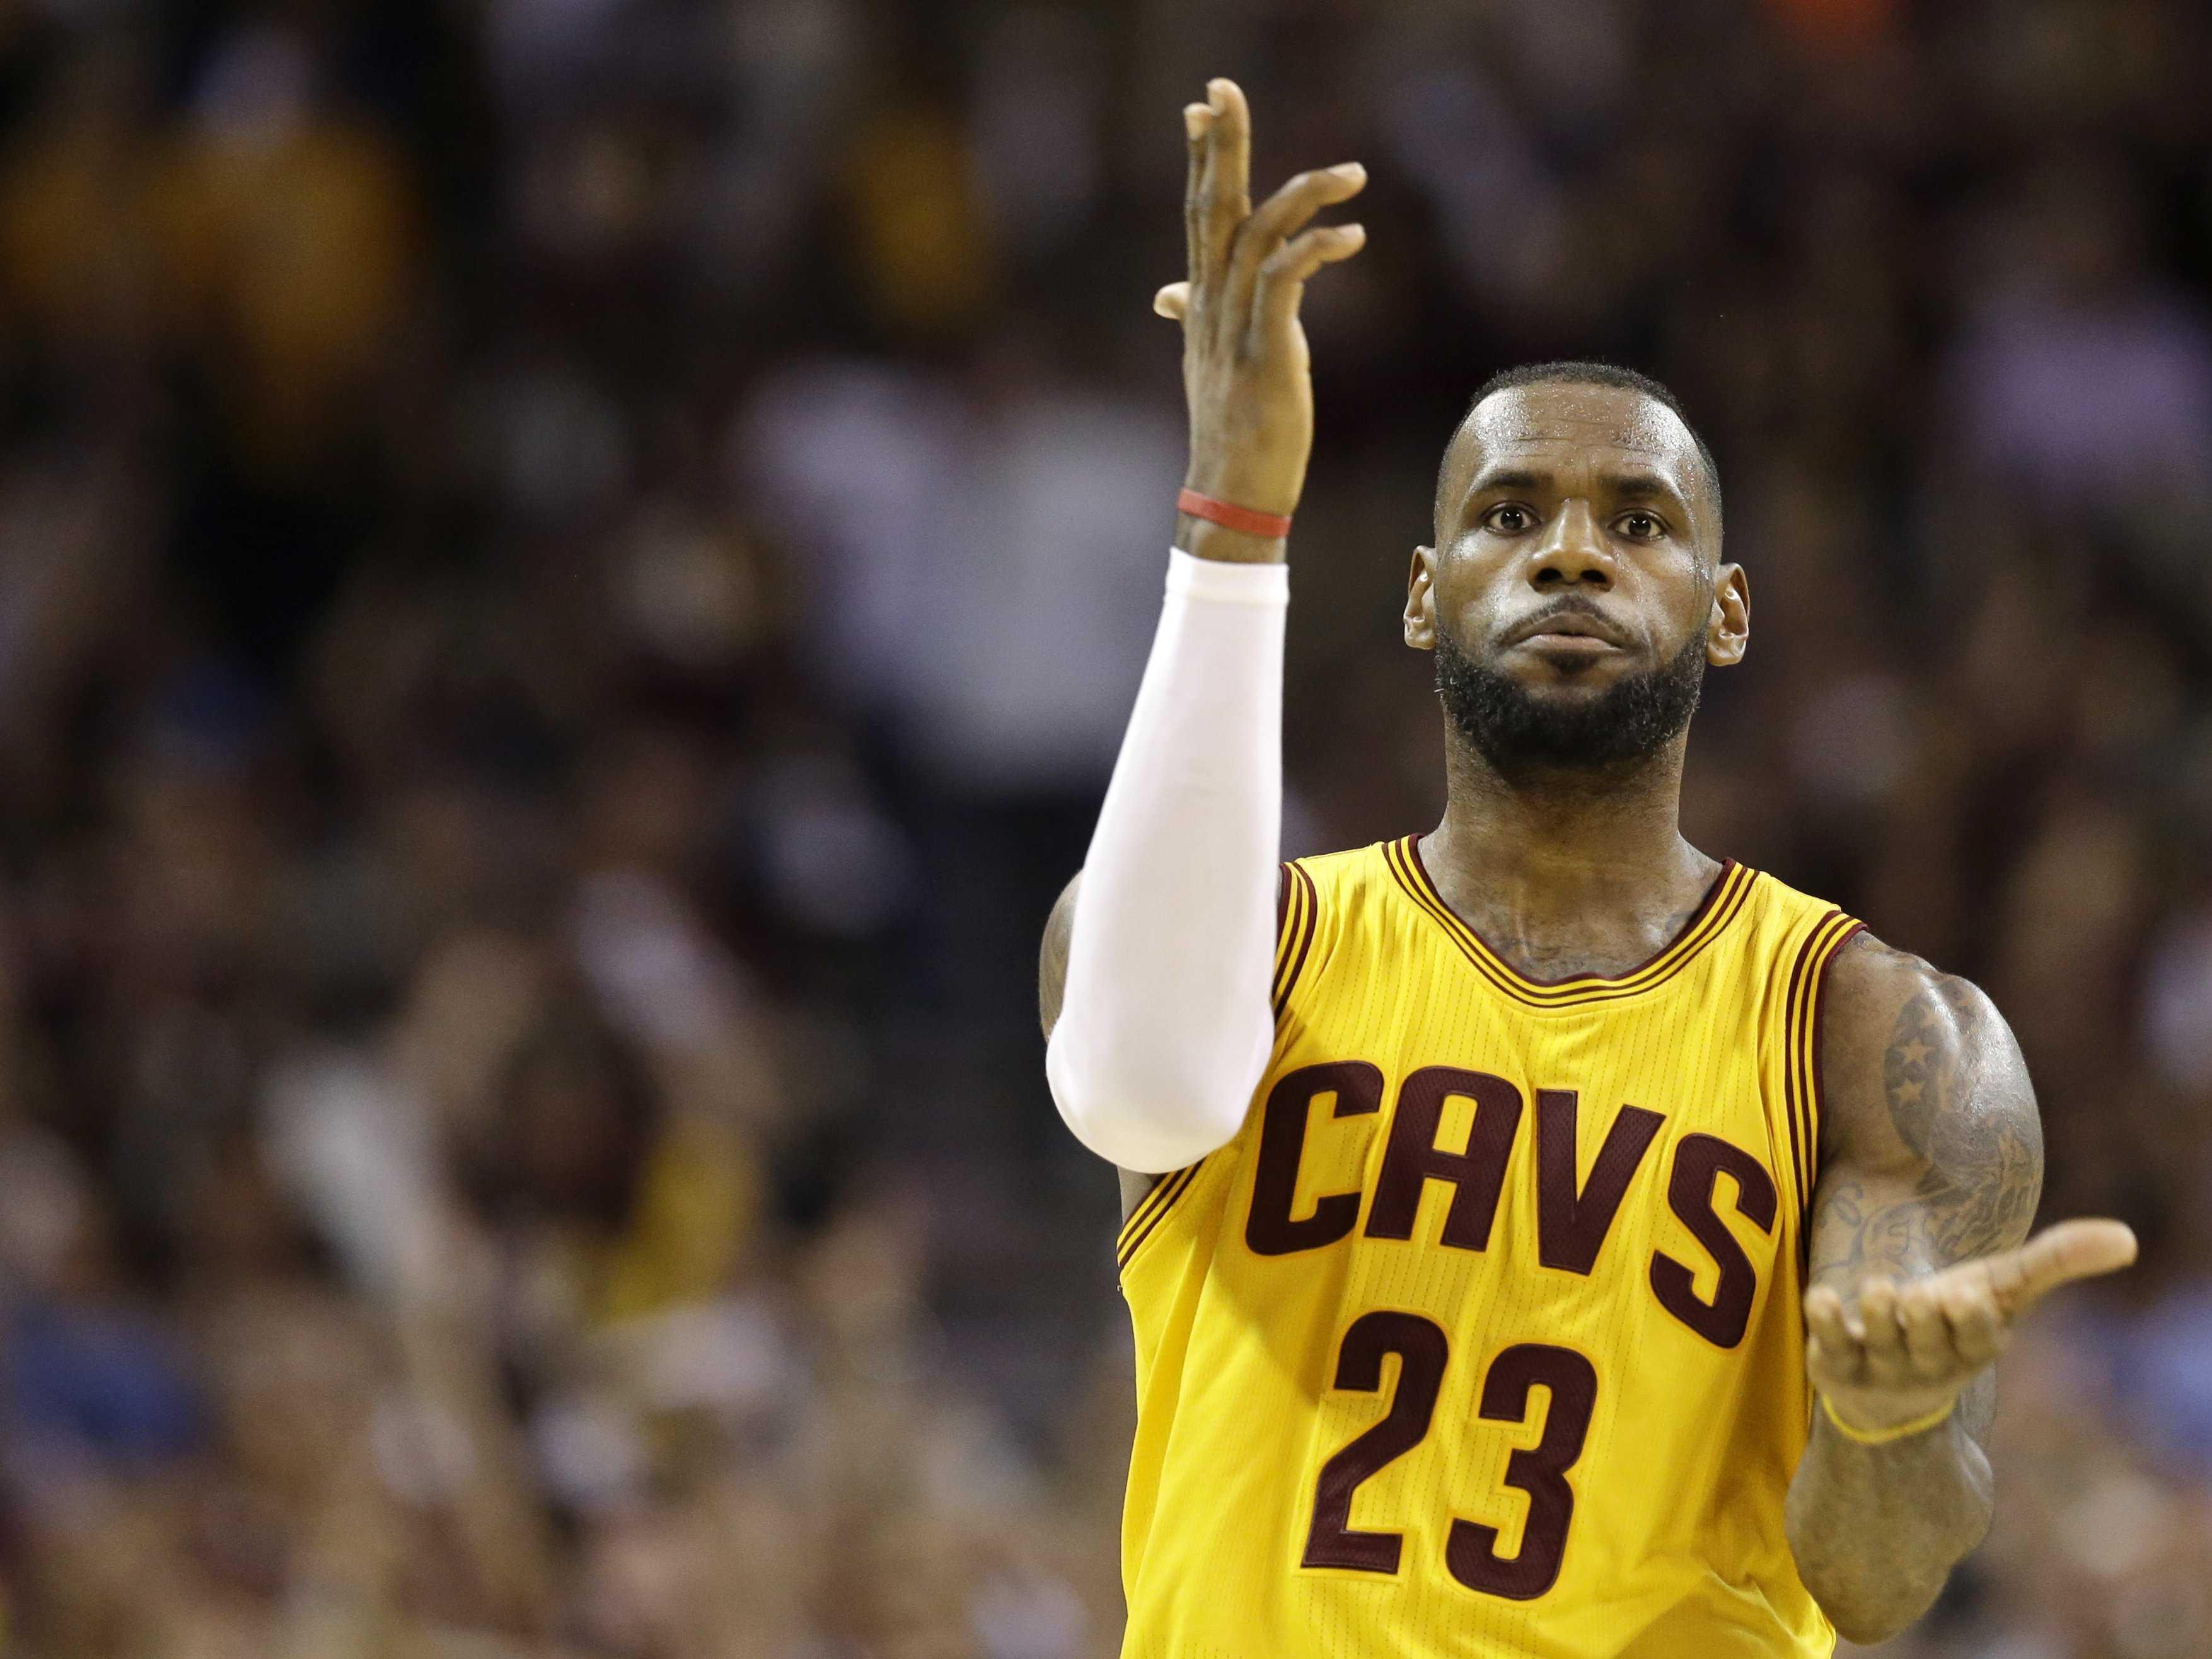 NBA十大最具影响力球员:库里力压科比 第一无悬念